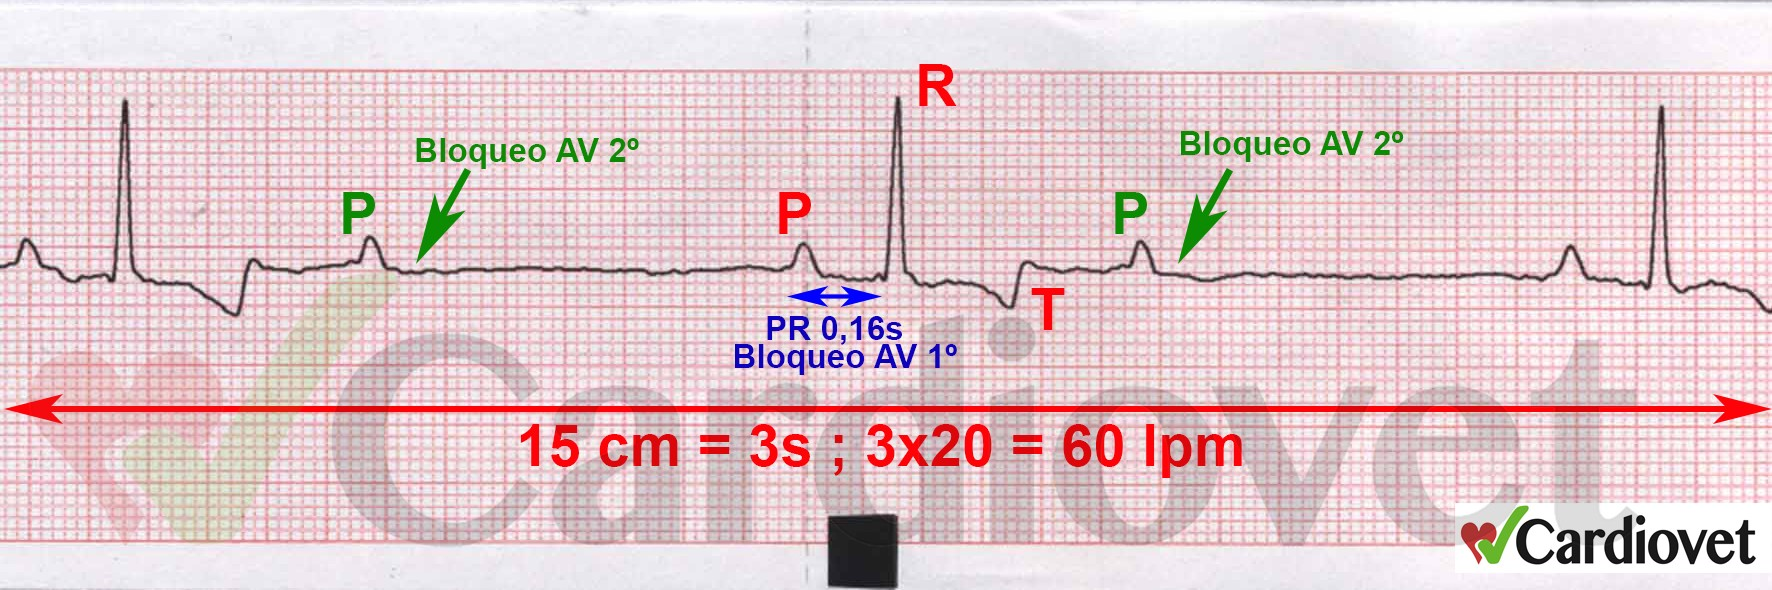 ECG del mes ene-feb 2016 Bloqueo AV 1ºy 2º solución